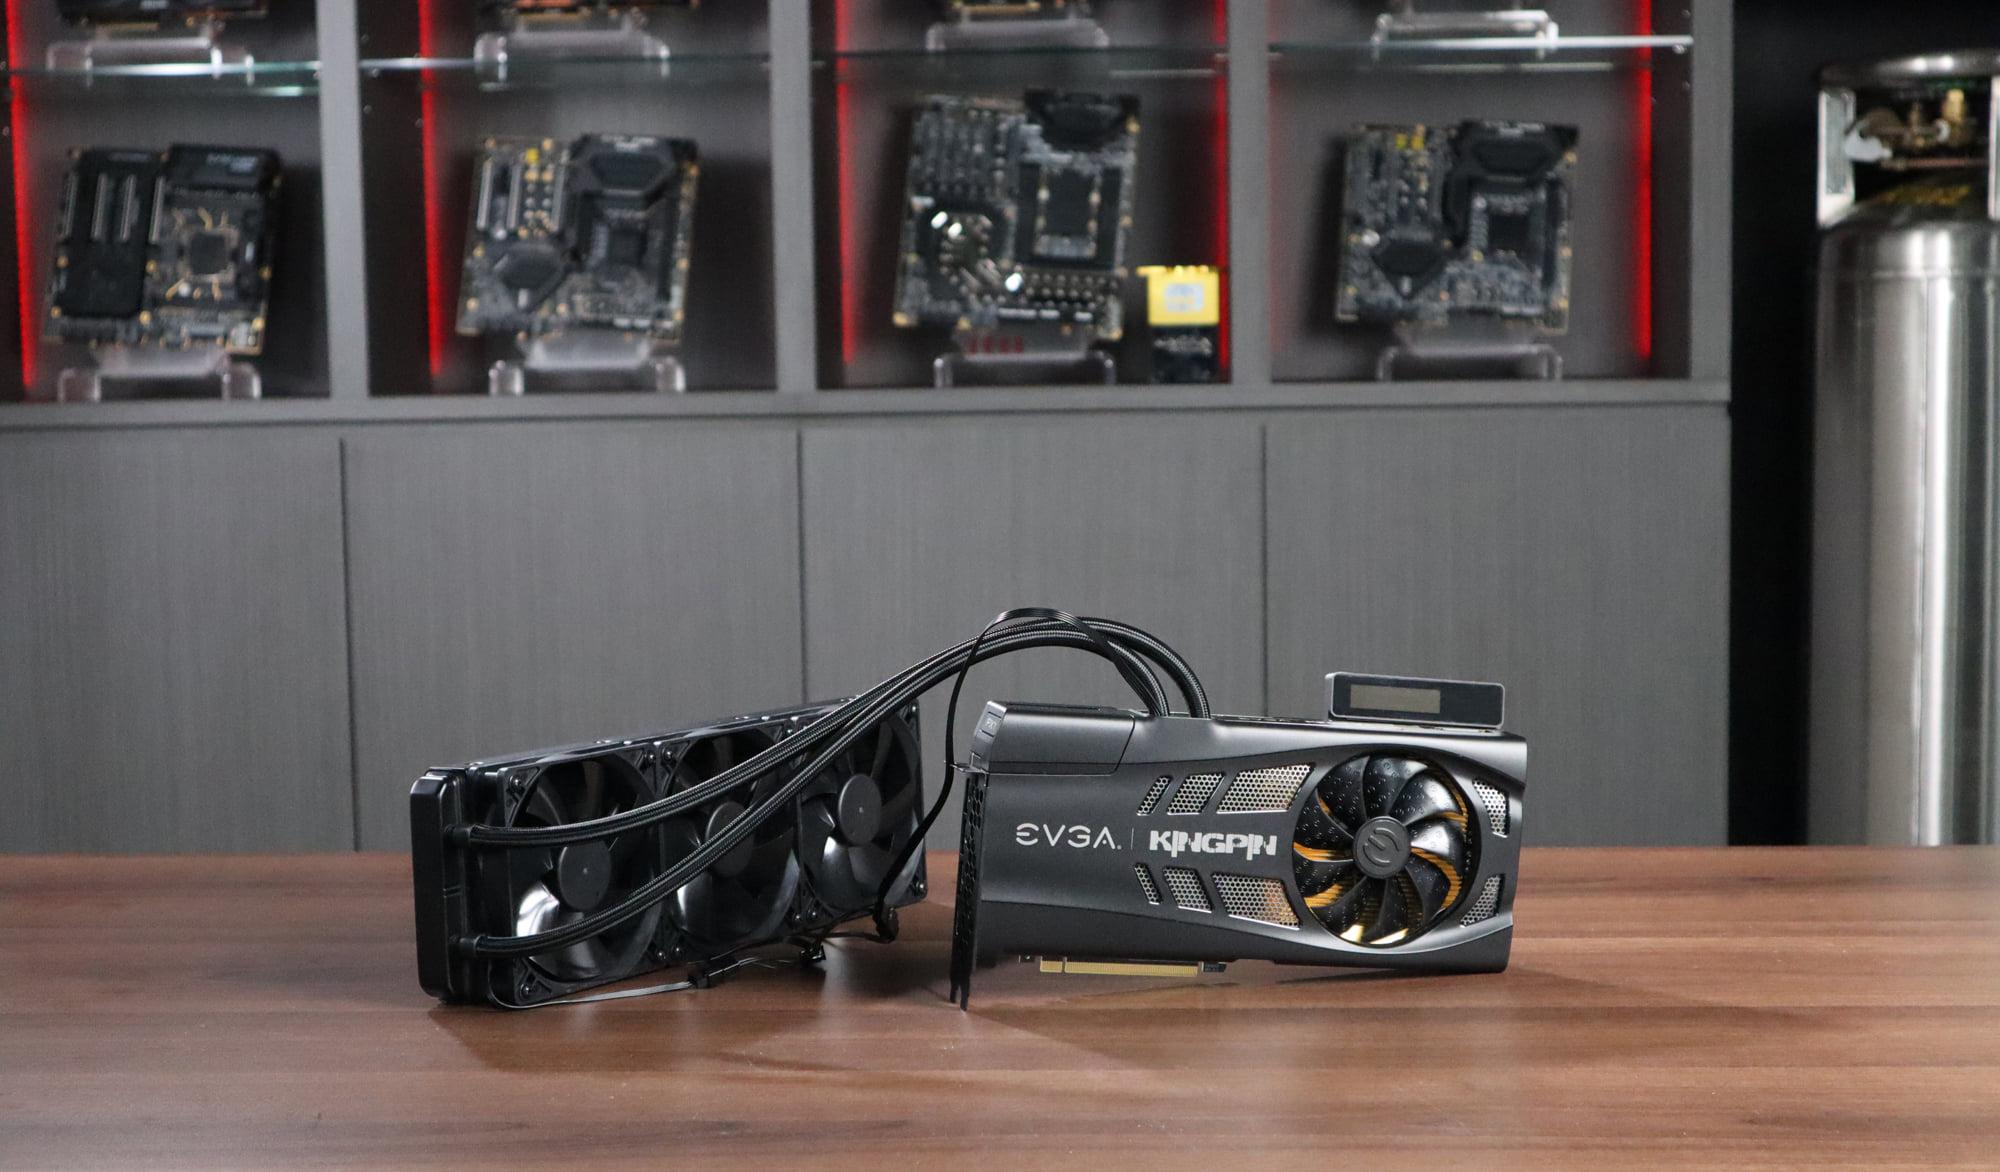 EVGA GeForce RTX 3090 KINGPIN Hybrid Graphics Card Pictured, Menampilkan 360mm AIO Liquid Cooler